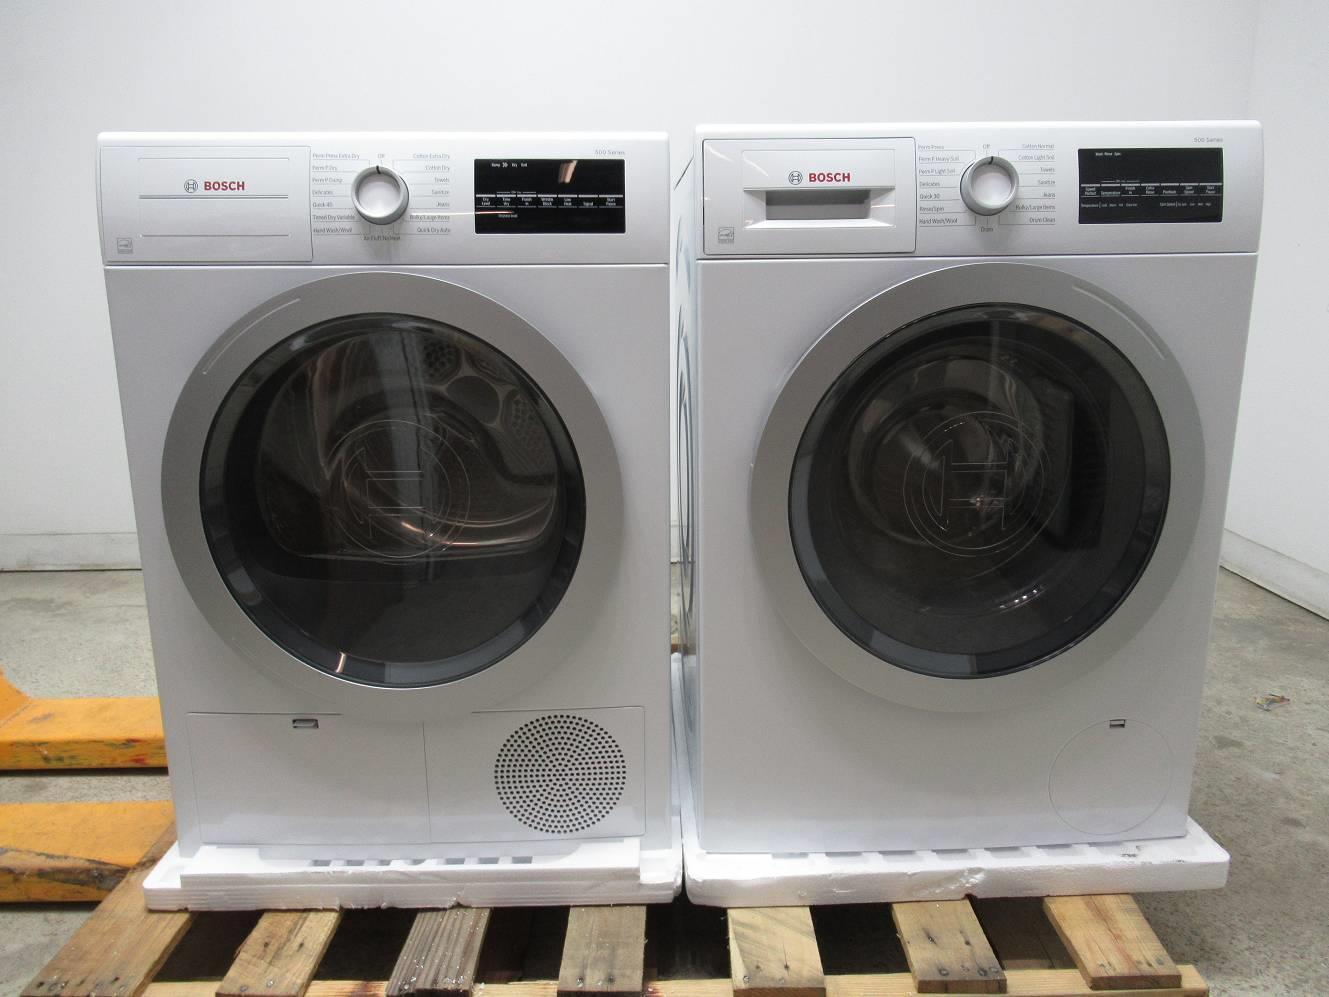 Bosch 500 Series Wht Front 15 Progams Washer Dryer Wat28401uc Wtg86401uc